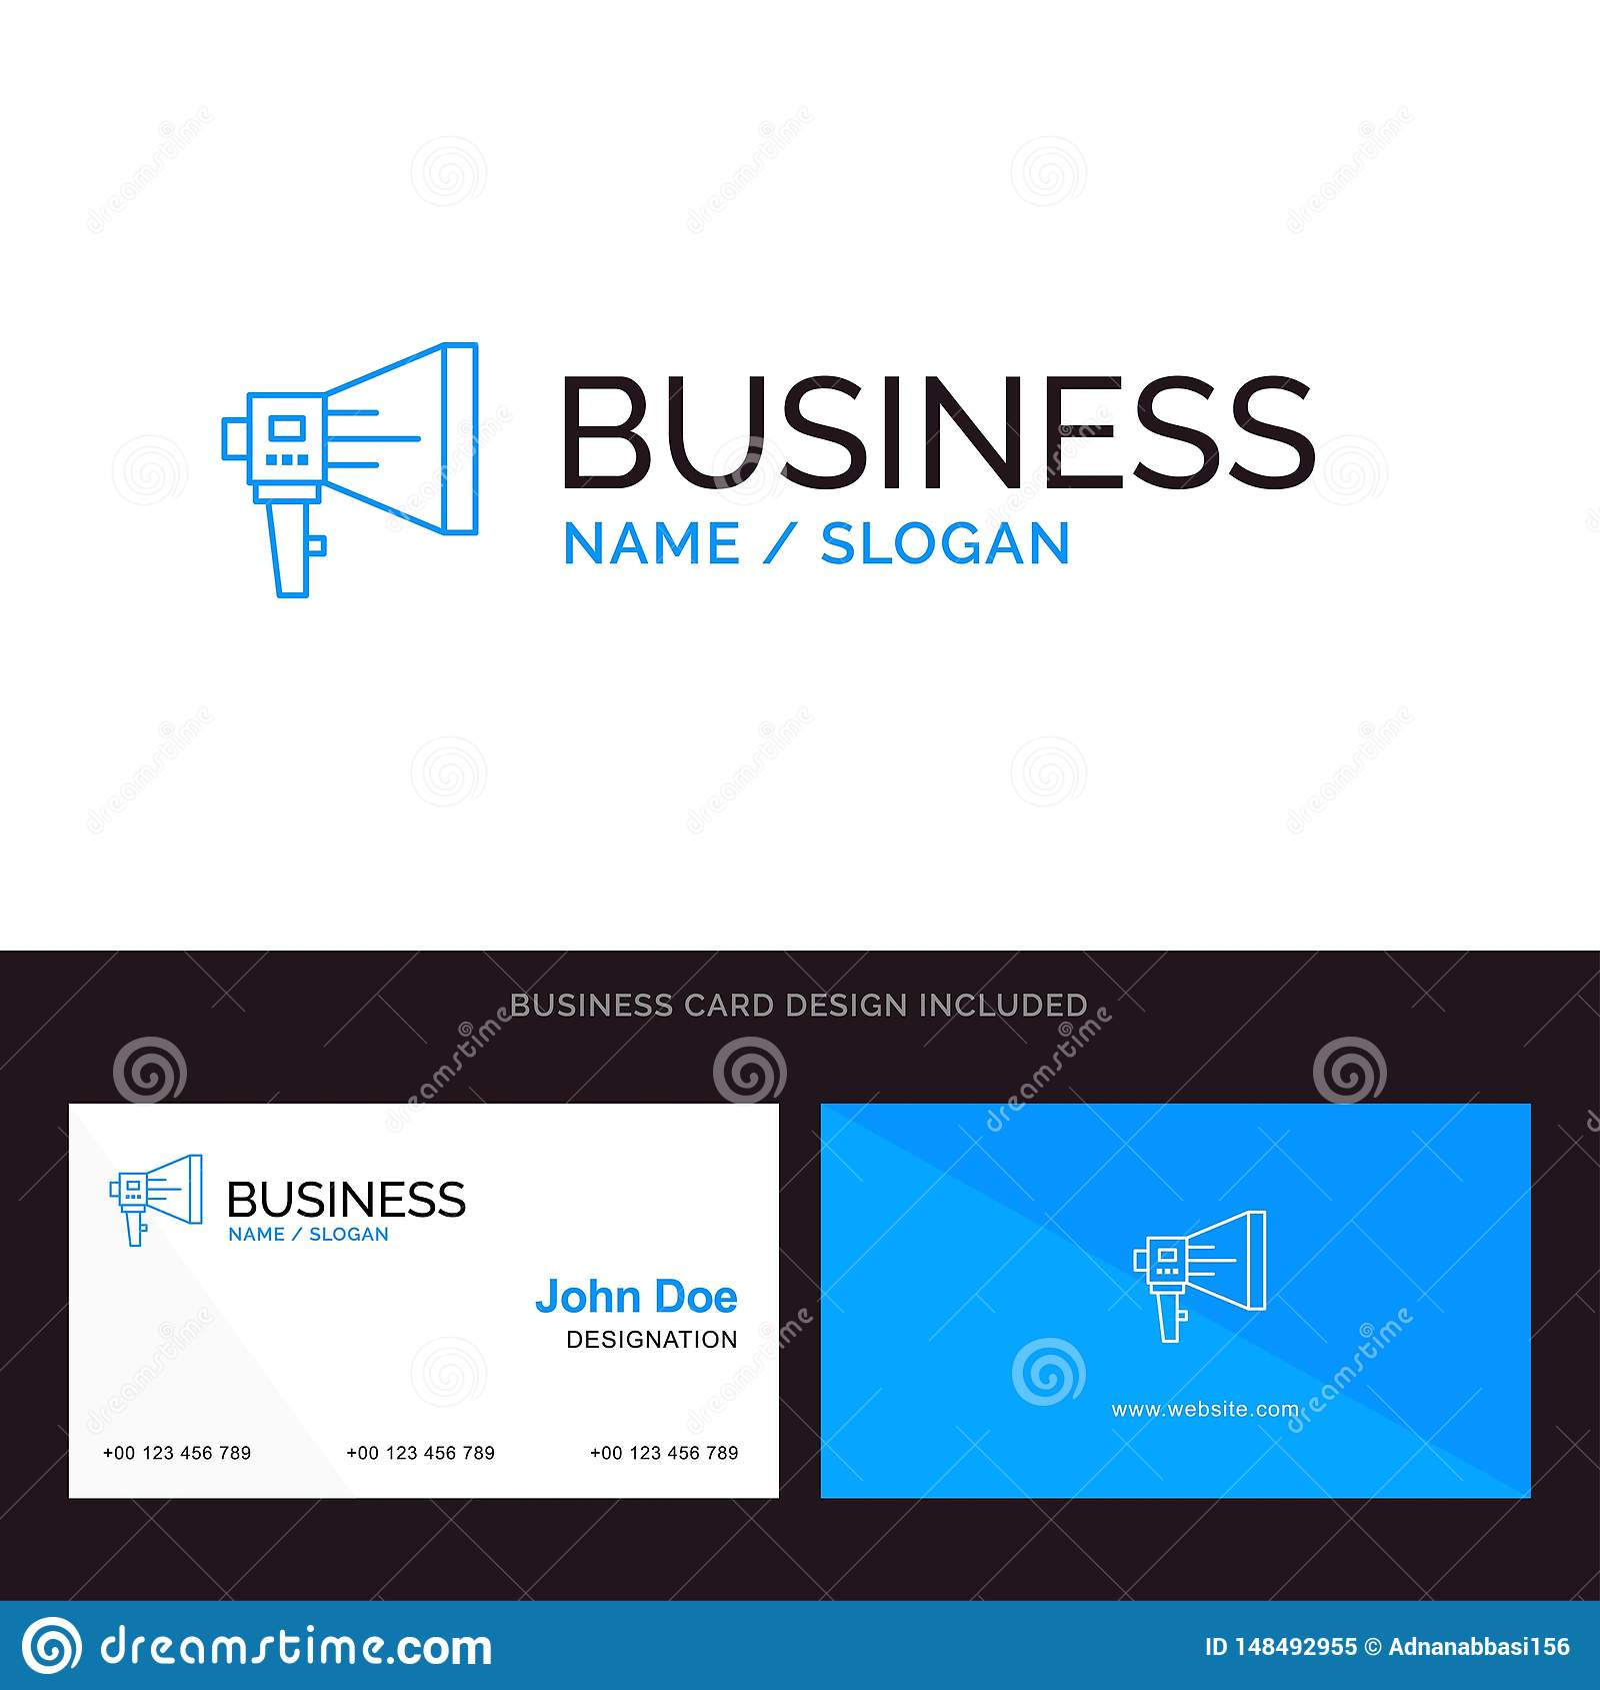 Announce Digital Loudspeaker Marketing Megaphone Speaker Tool Blue Business Logo And Business Card Template Front And Back Stock Vector Illustration Of Speech Hand 148492955